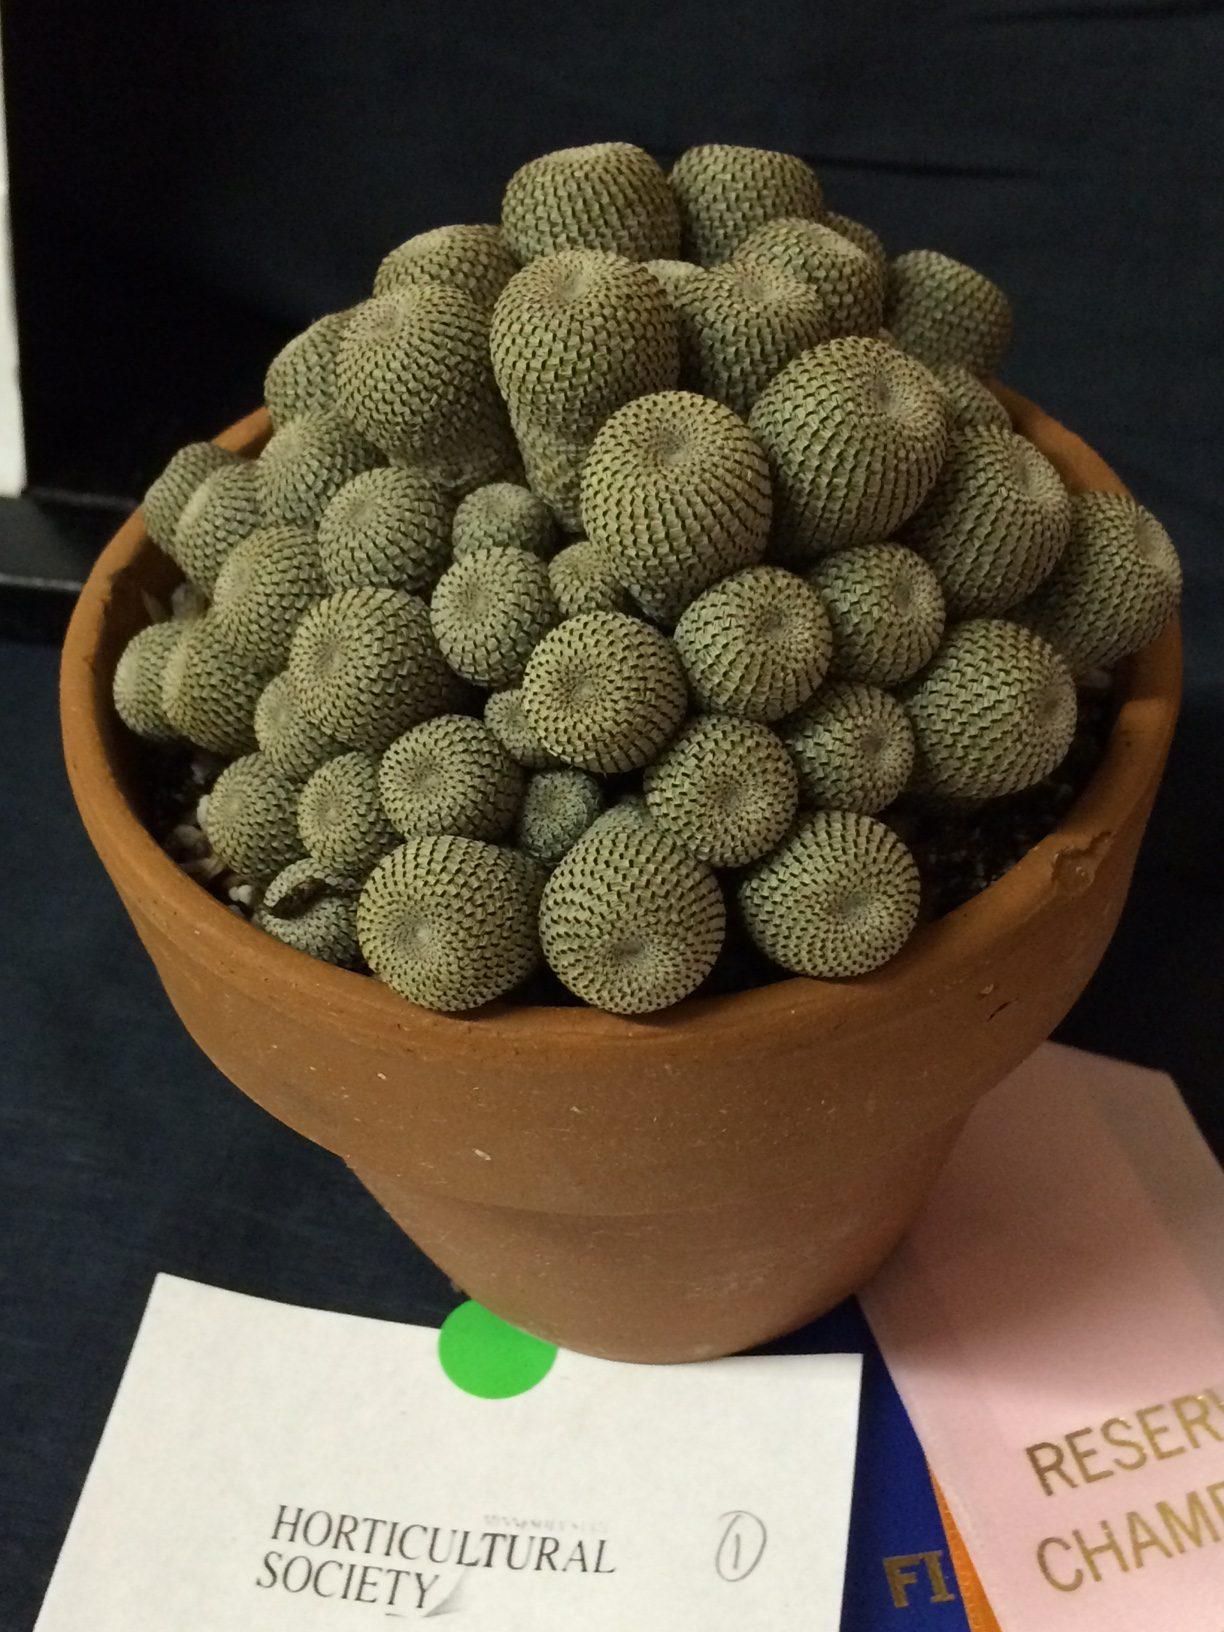 Isn't this a fun plant! W